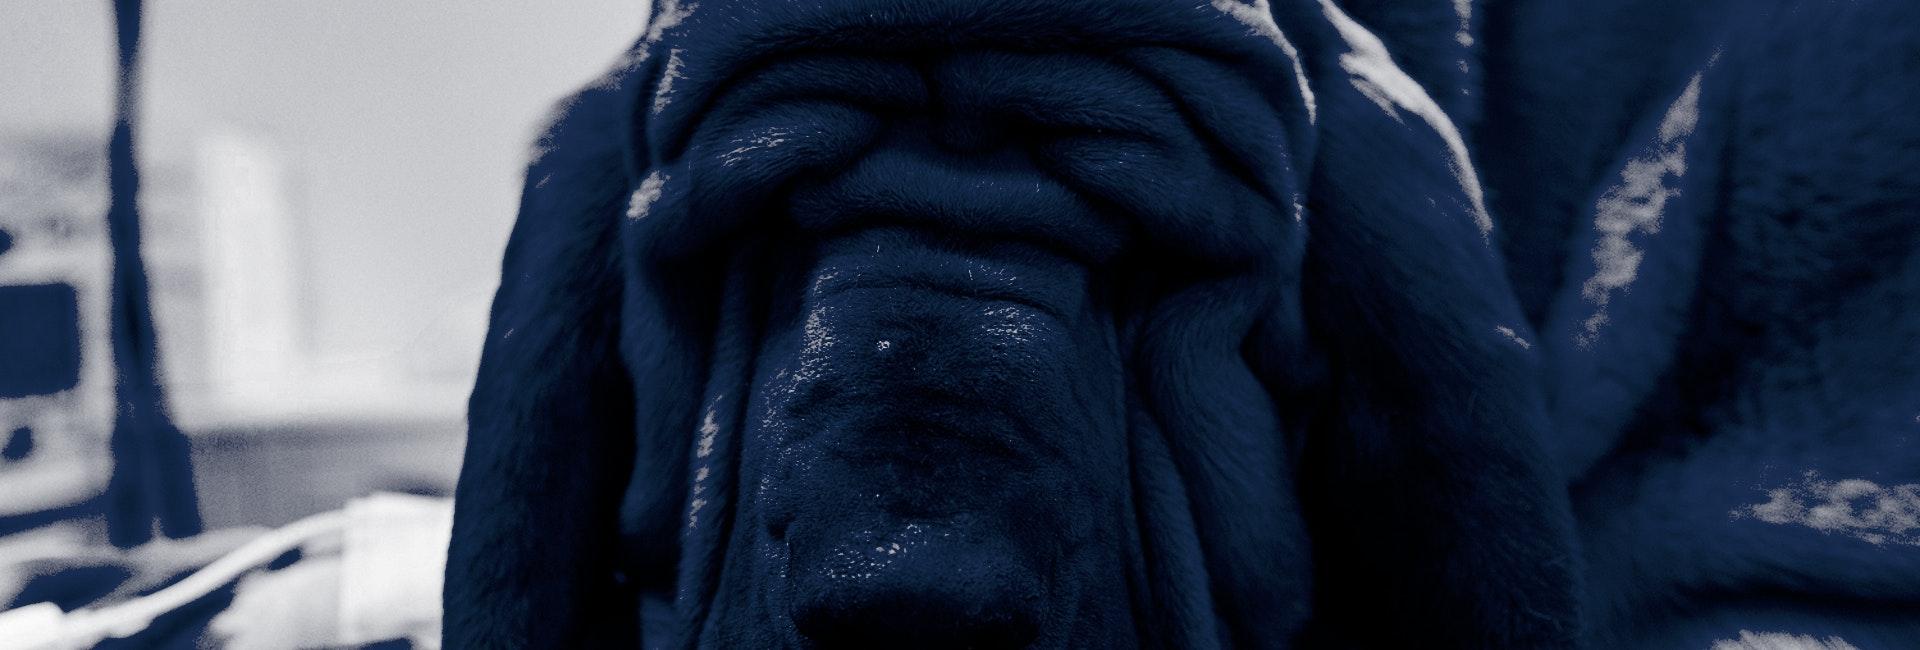 1592230570 sabato 27 bloodhound aslan soccorso alpino elettrochemio e tac22